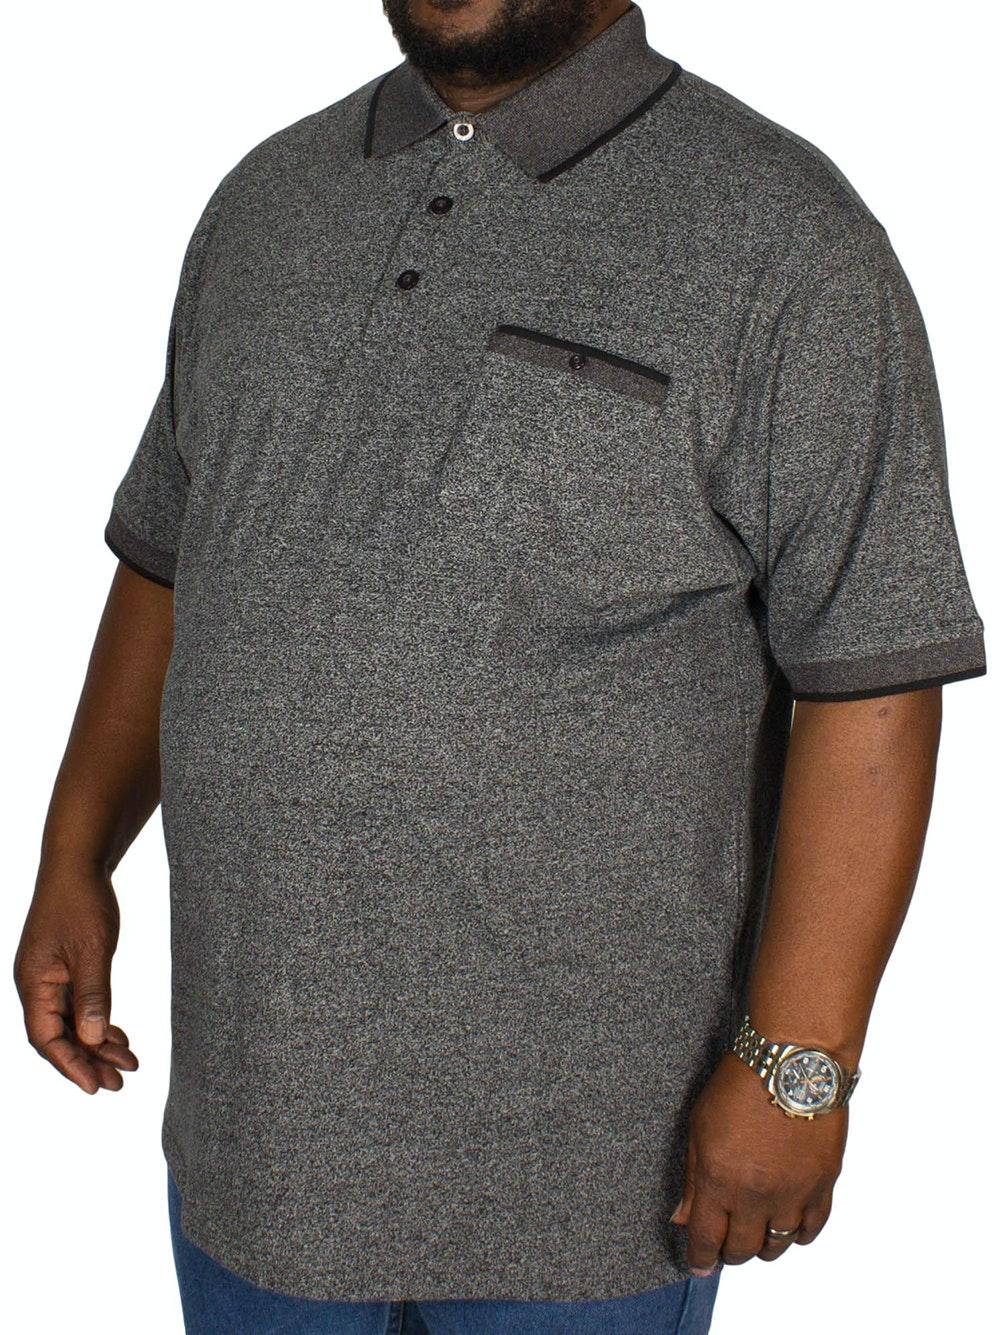 Espionage Jersey Marl Polo Shirt Charcoal